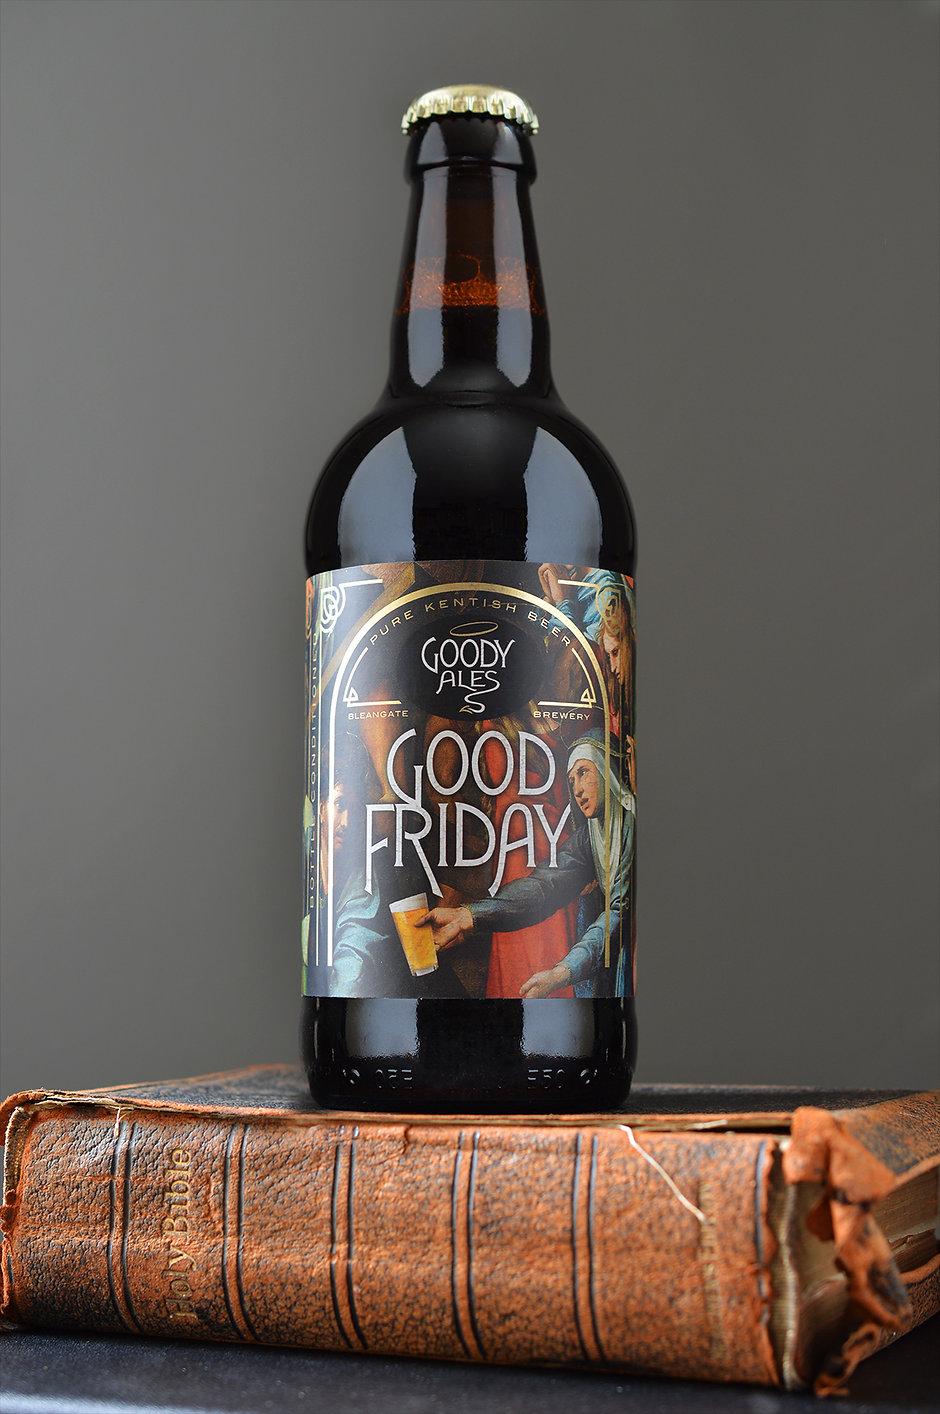 Sand Creative Goody Ales Good Friday